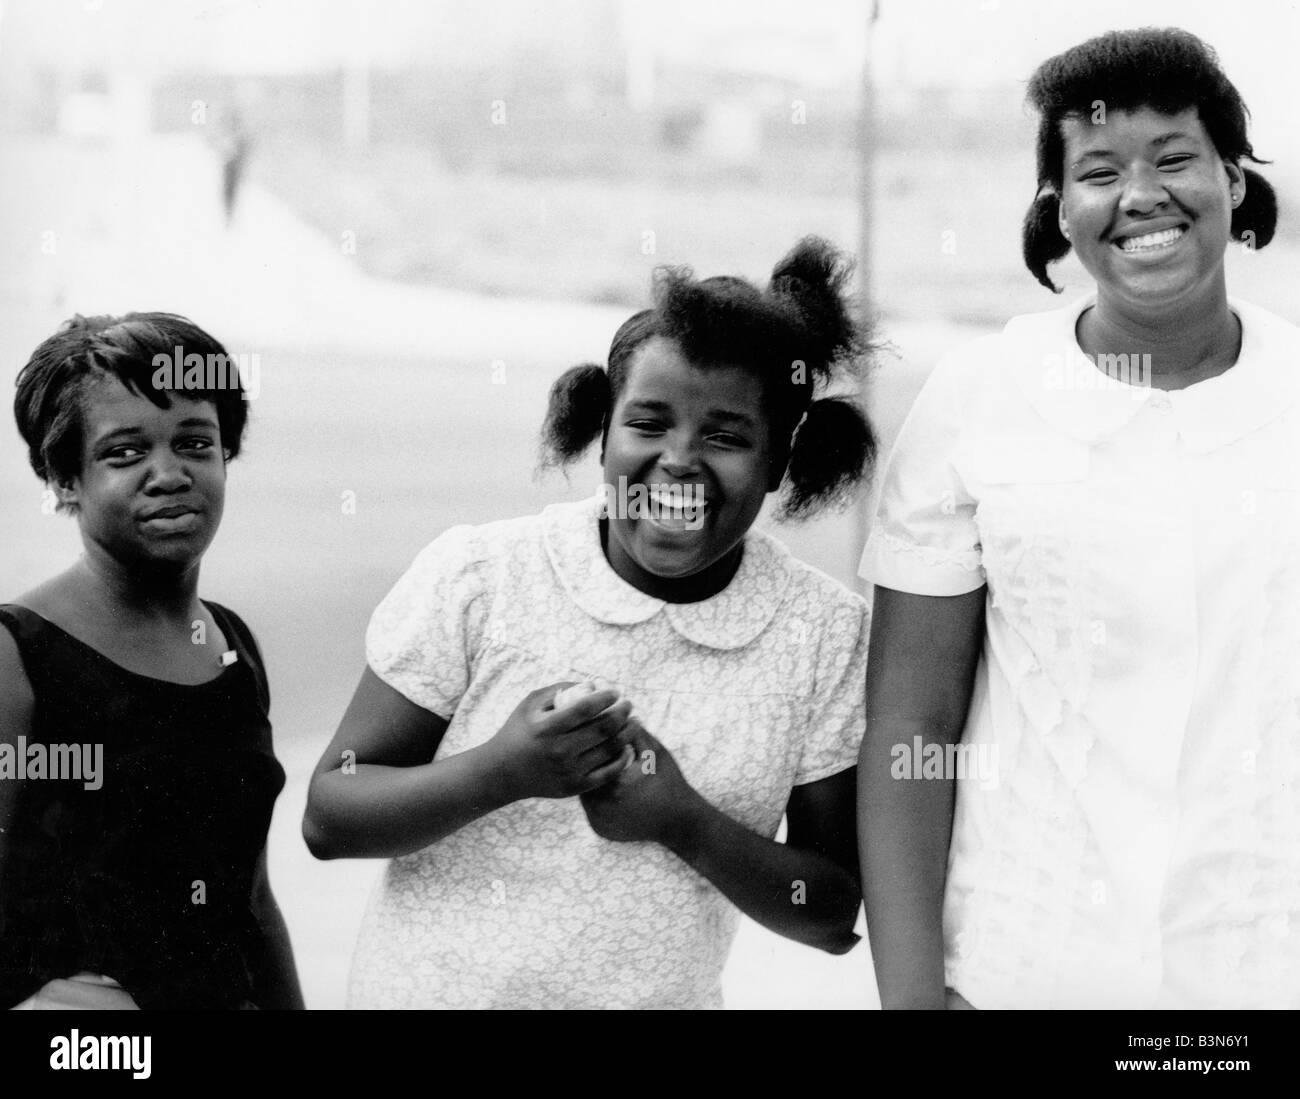 HAPPY GIRLS  Louisiana about 1980 - Stock Image